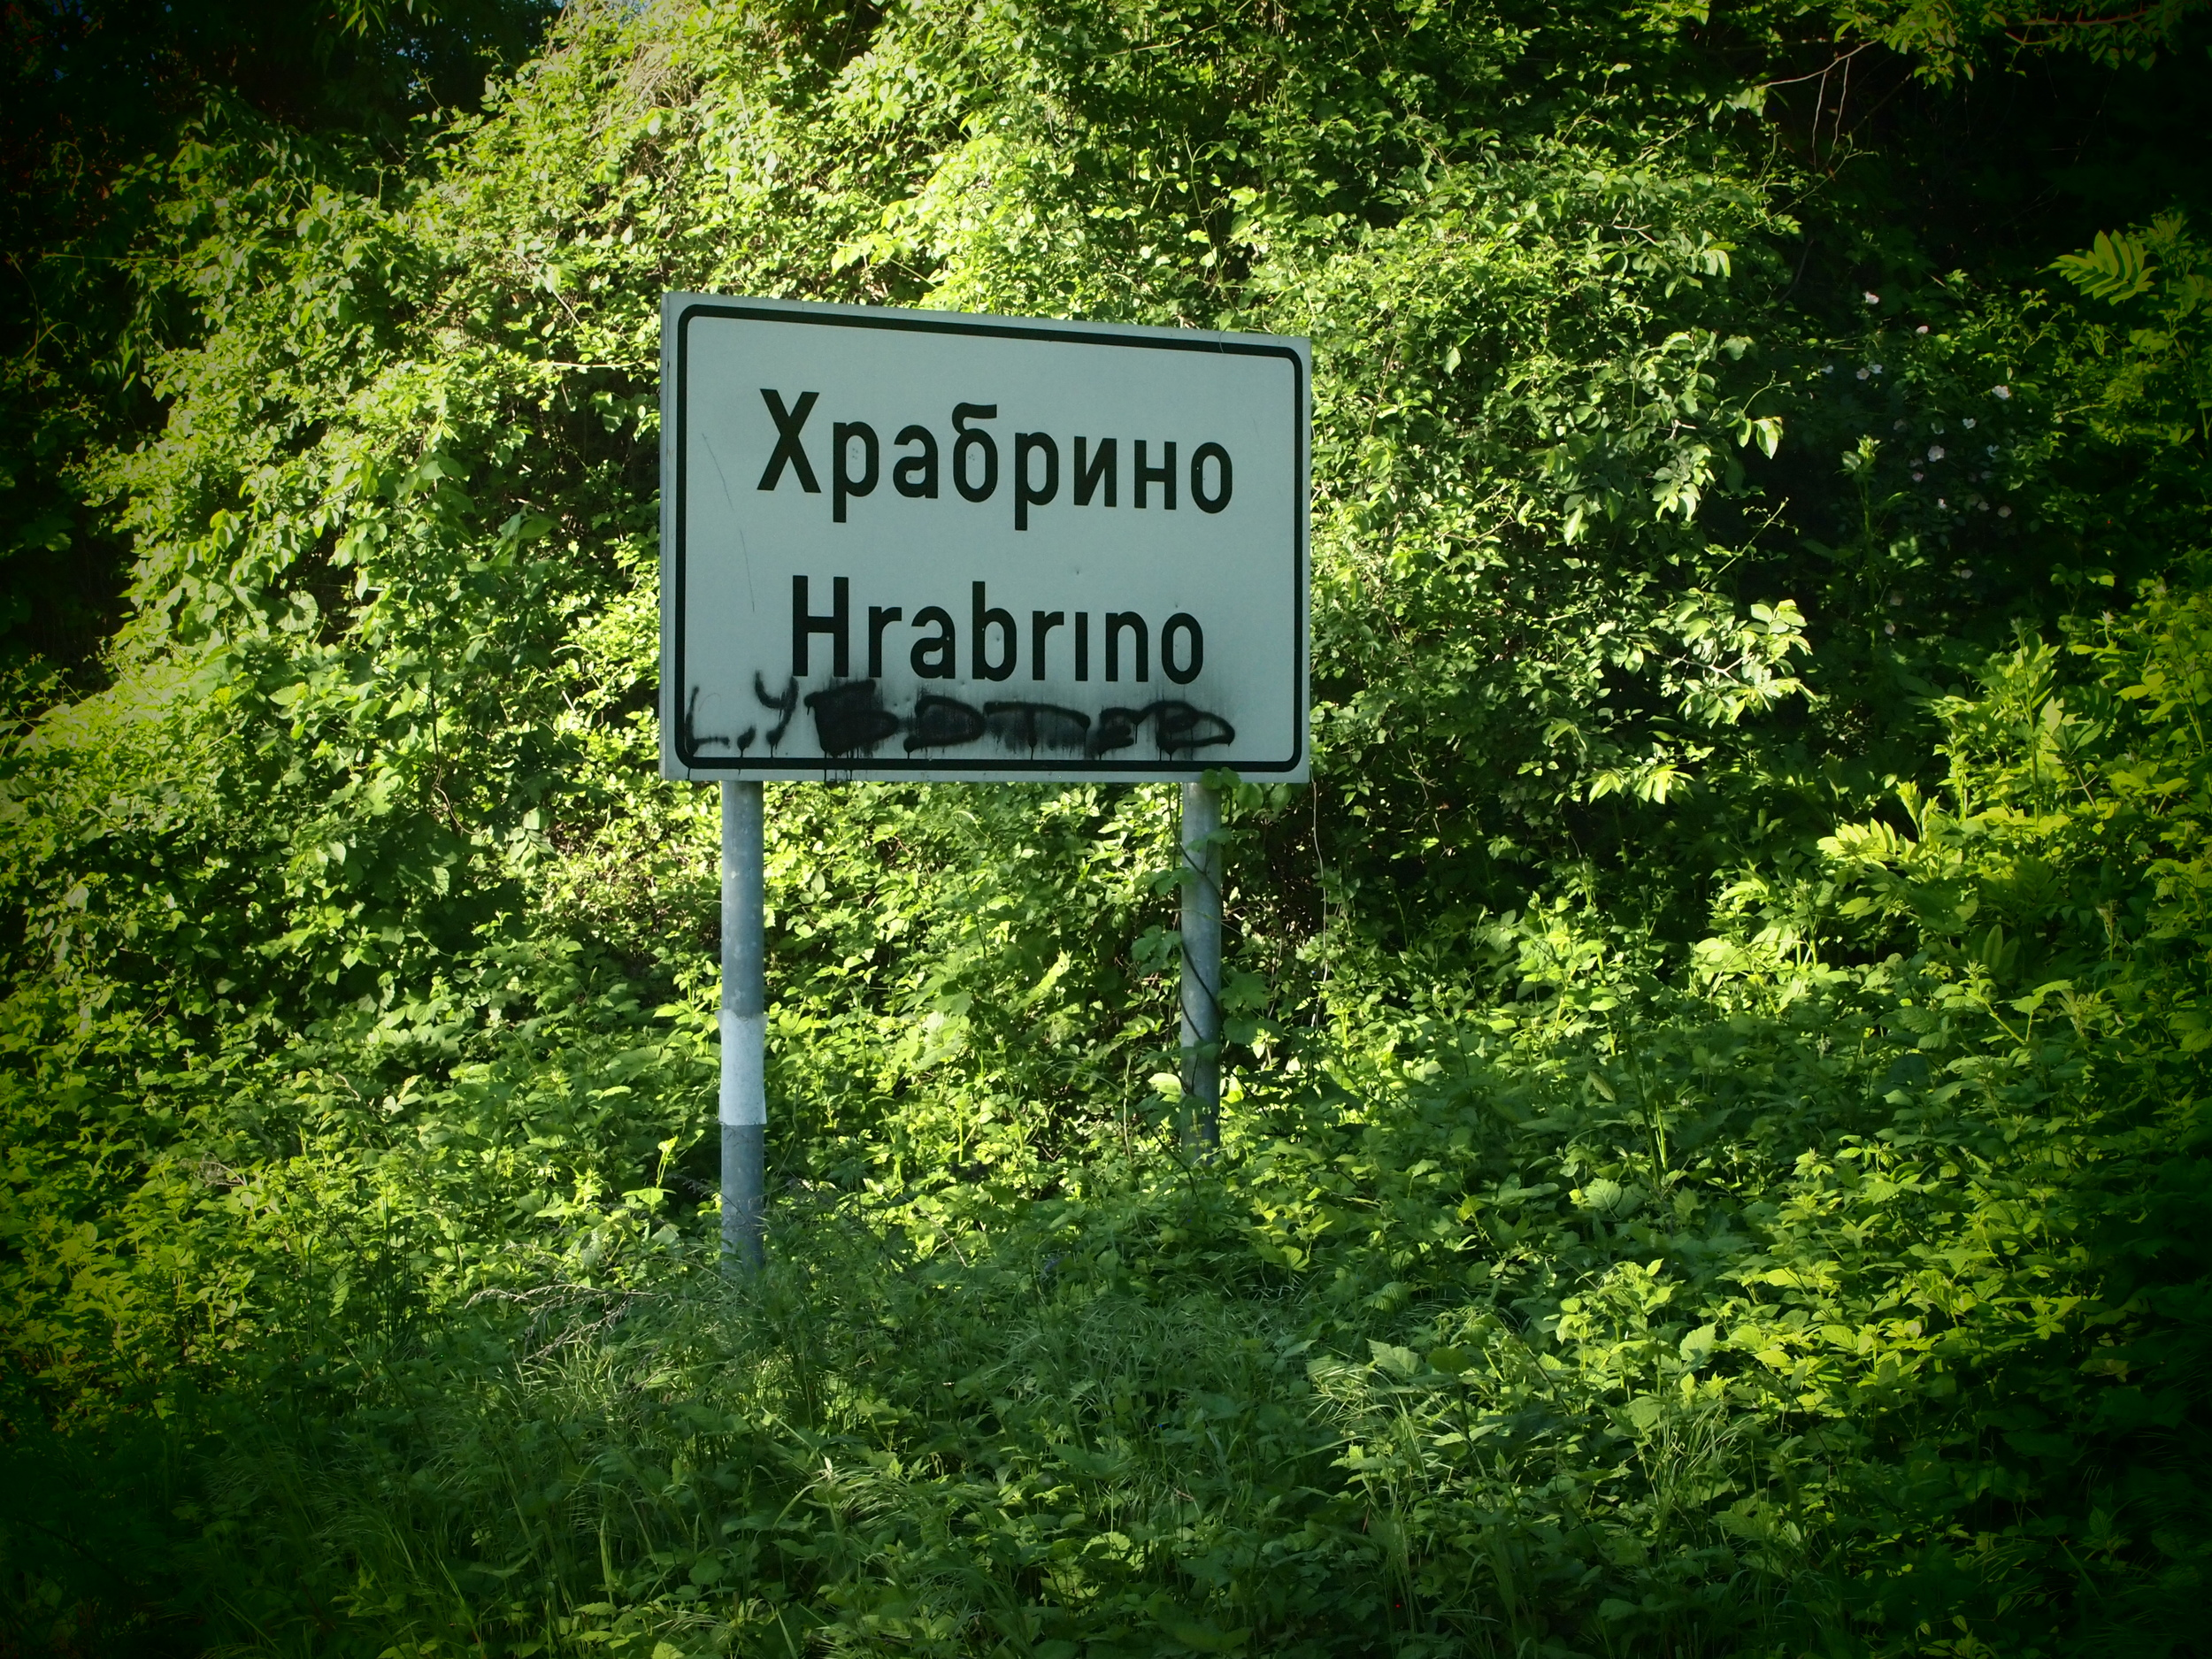 Welcome to Hrabrino!